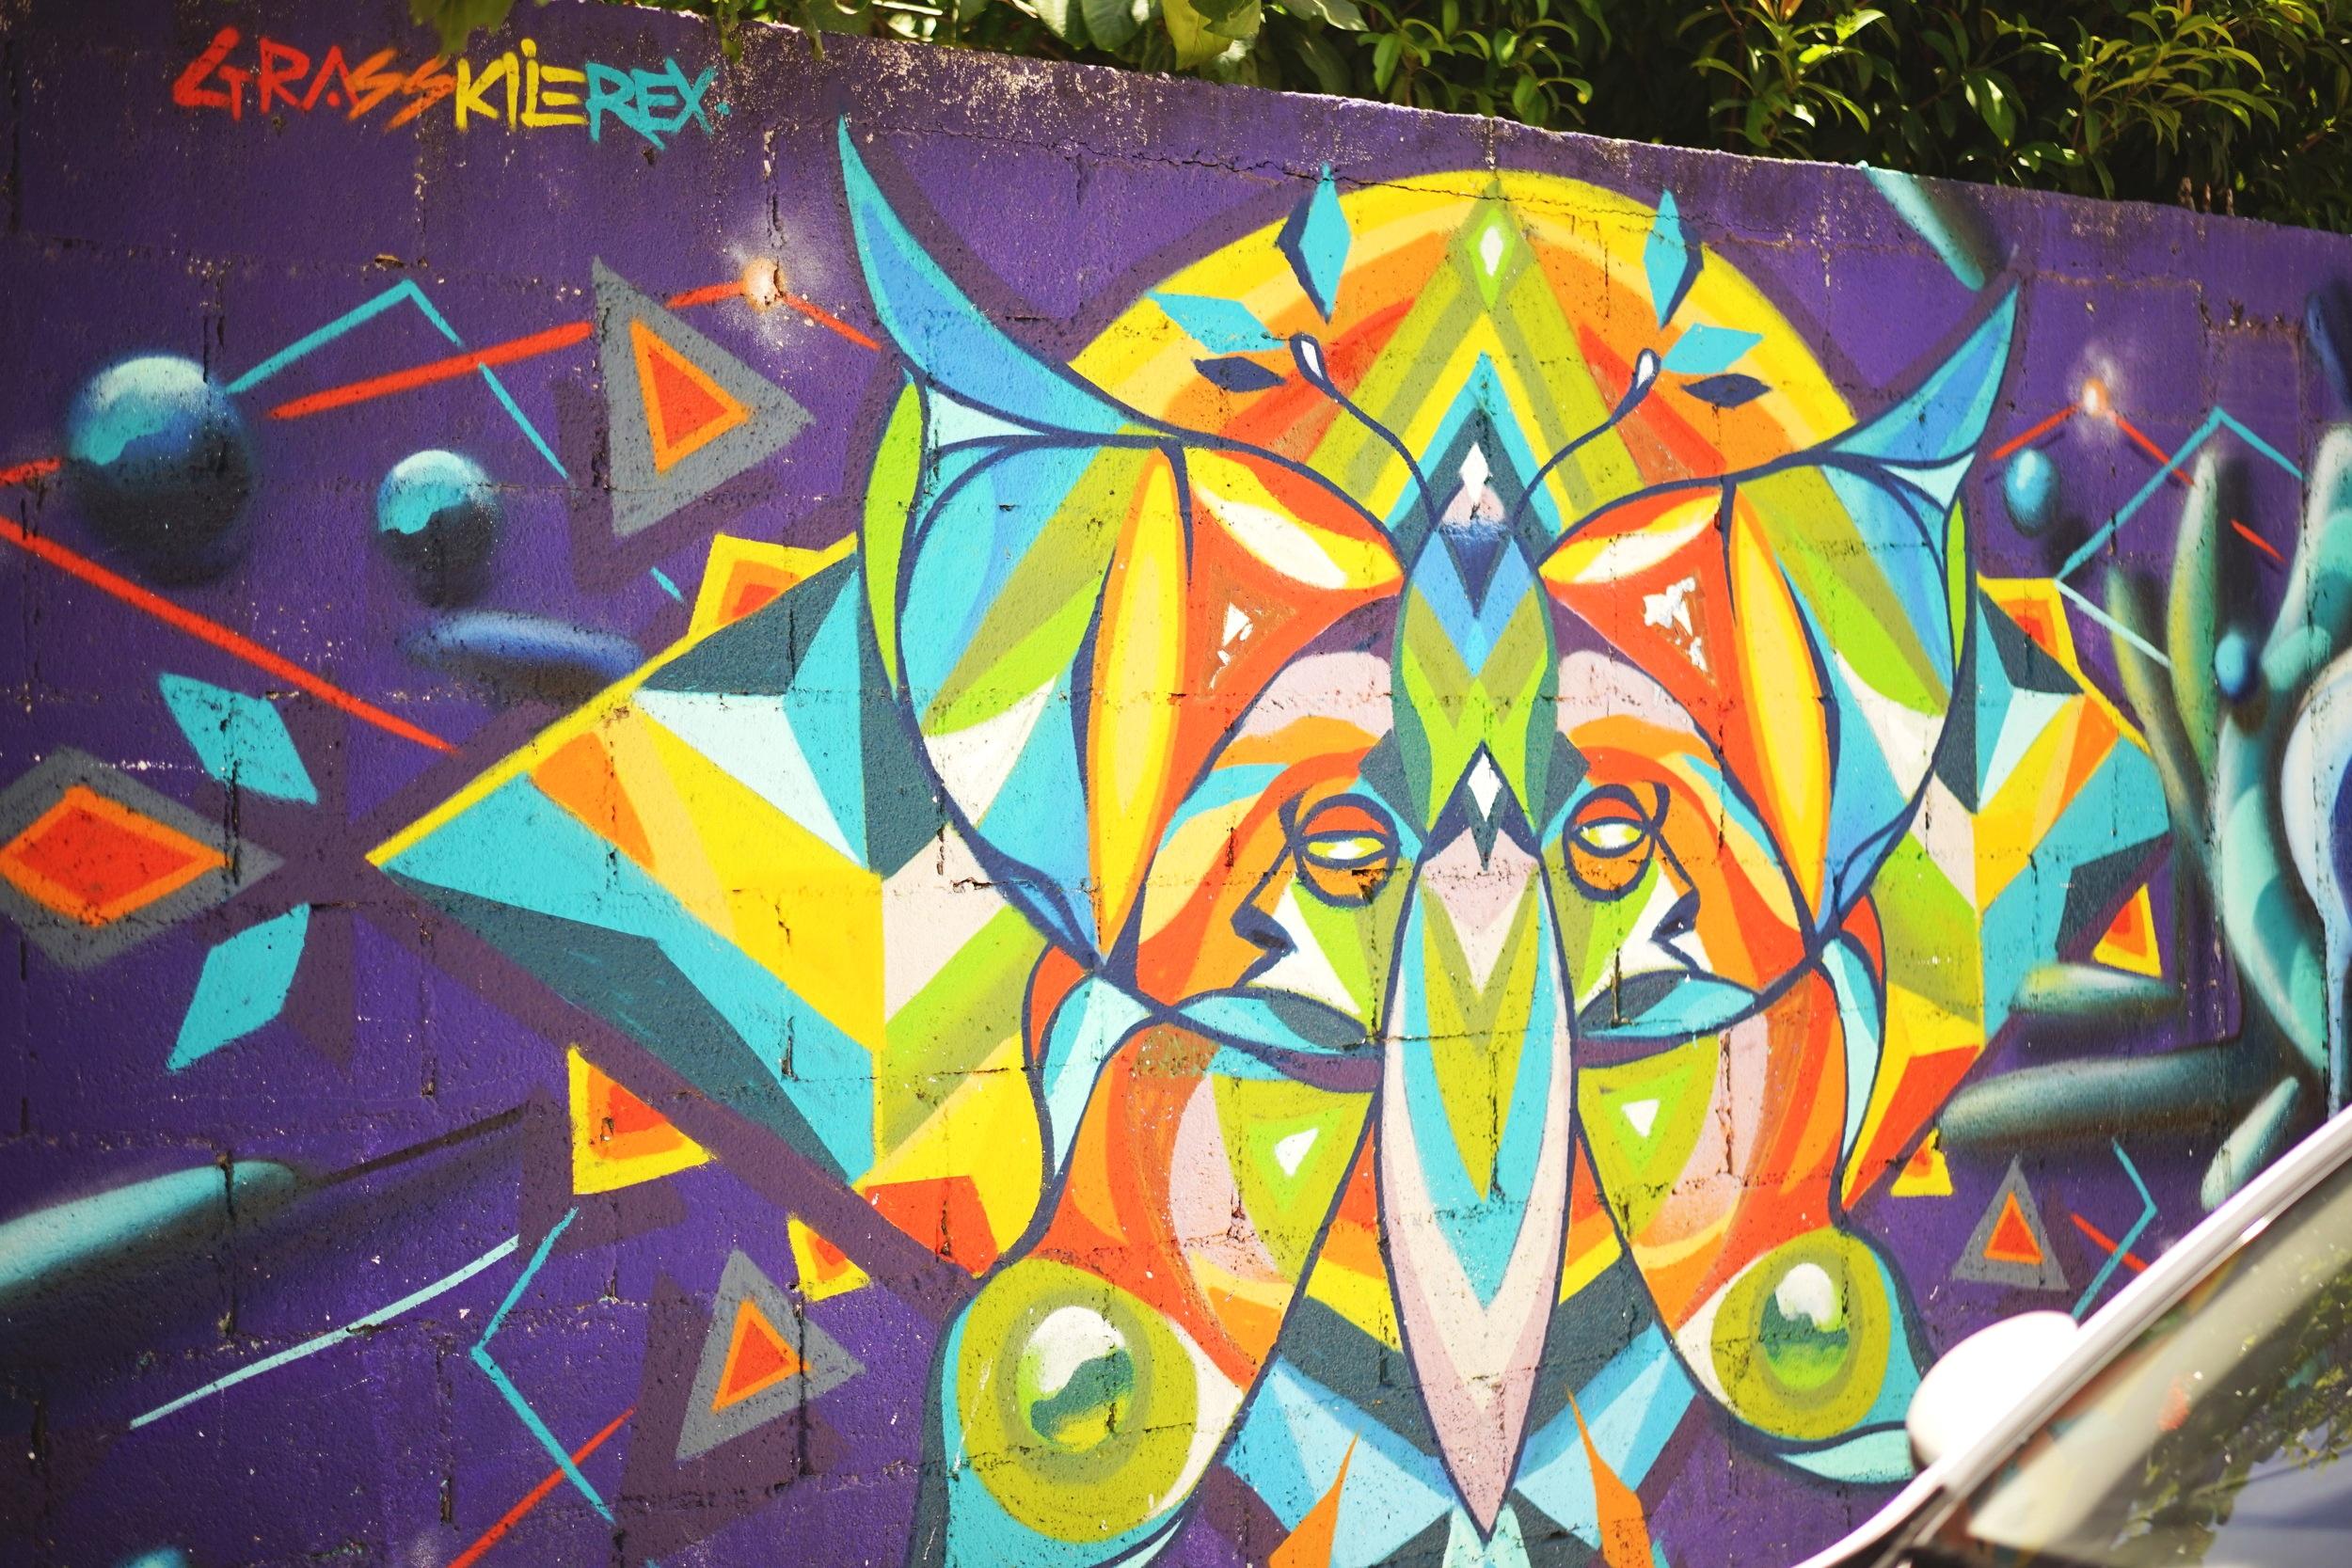 Artist Grass KieRex